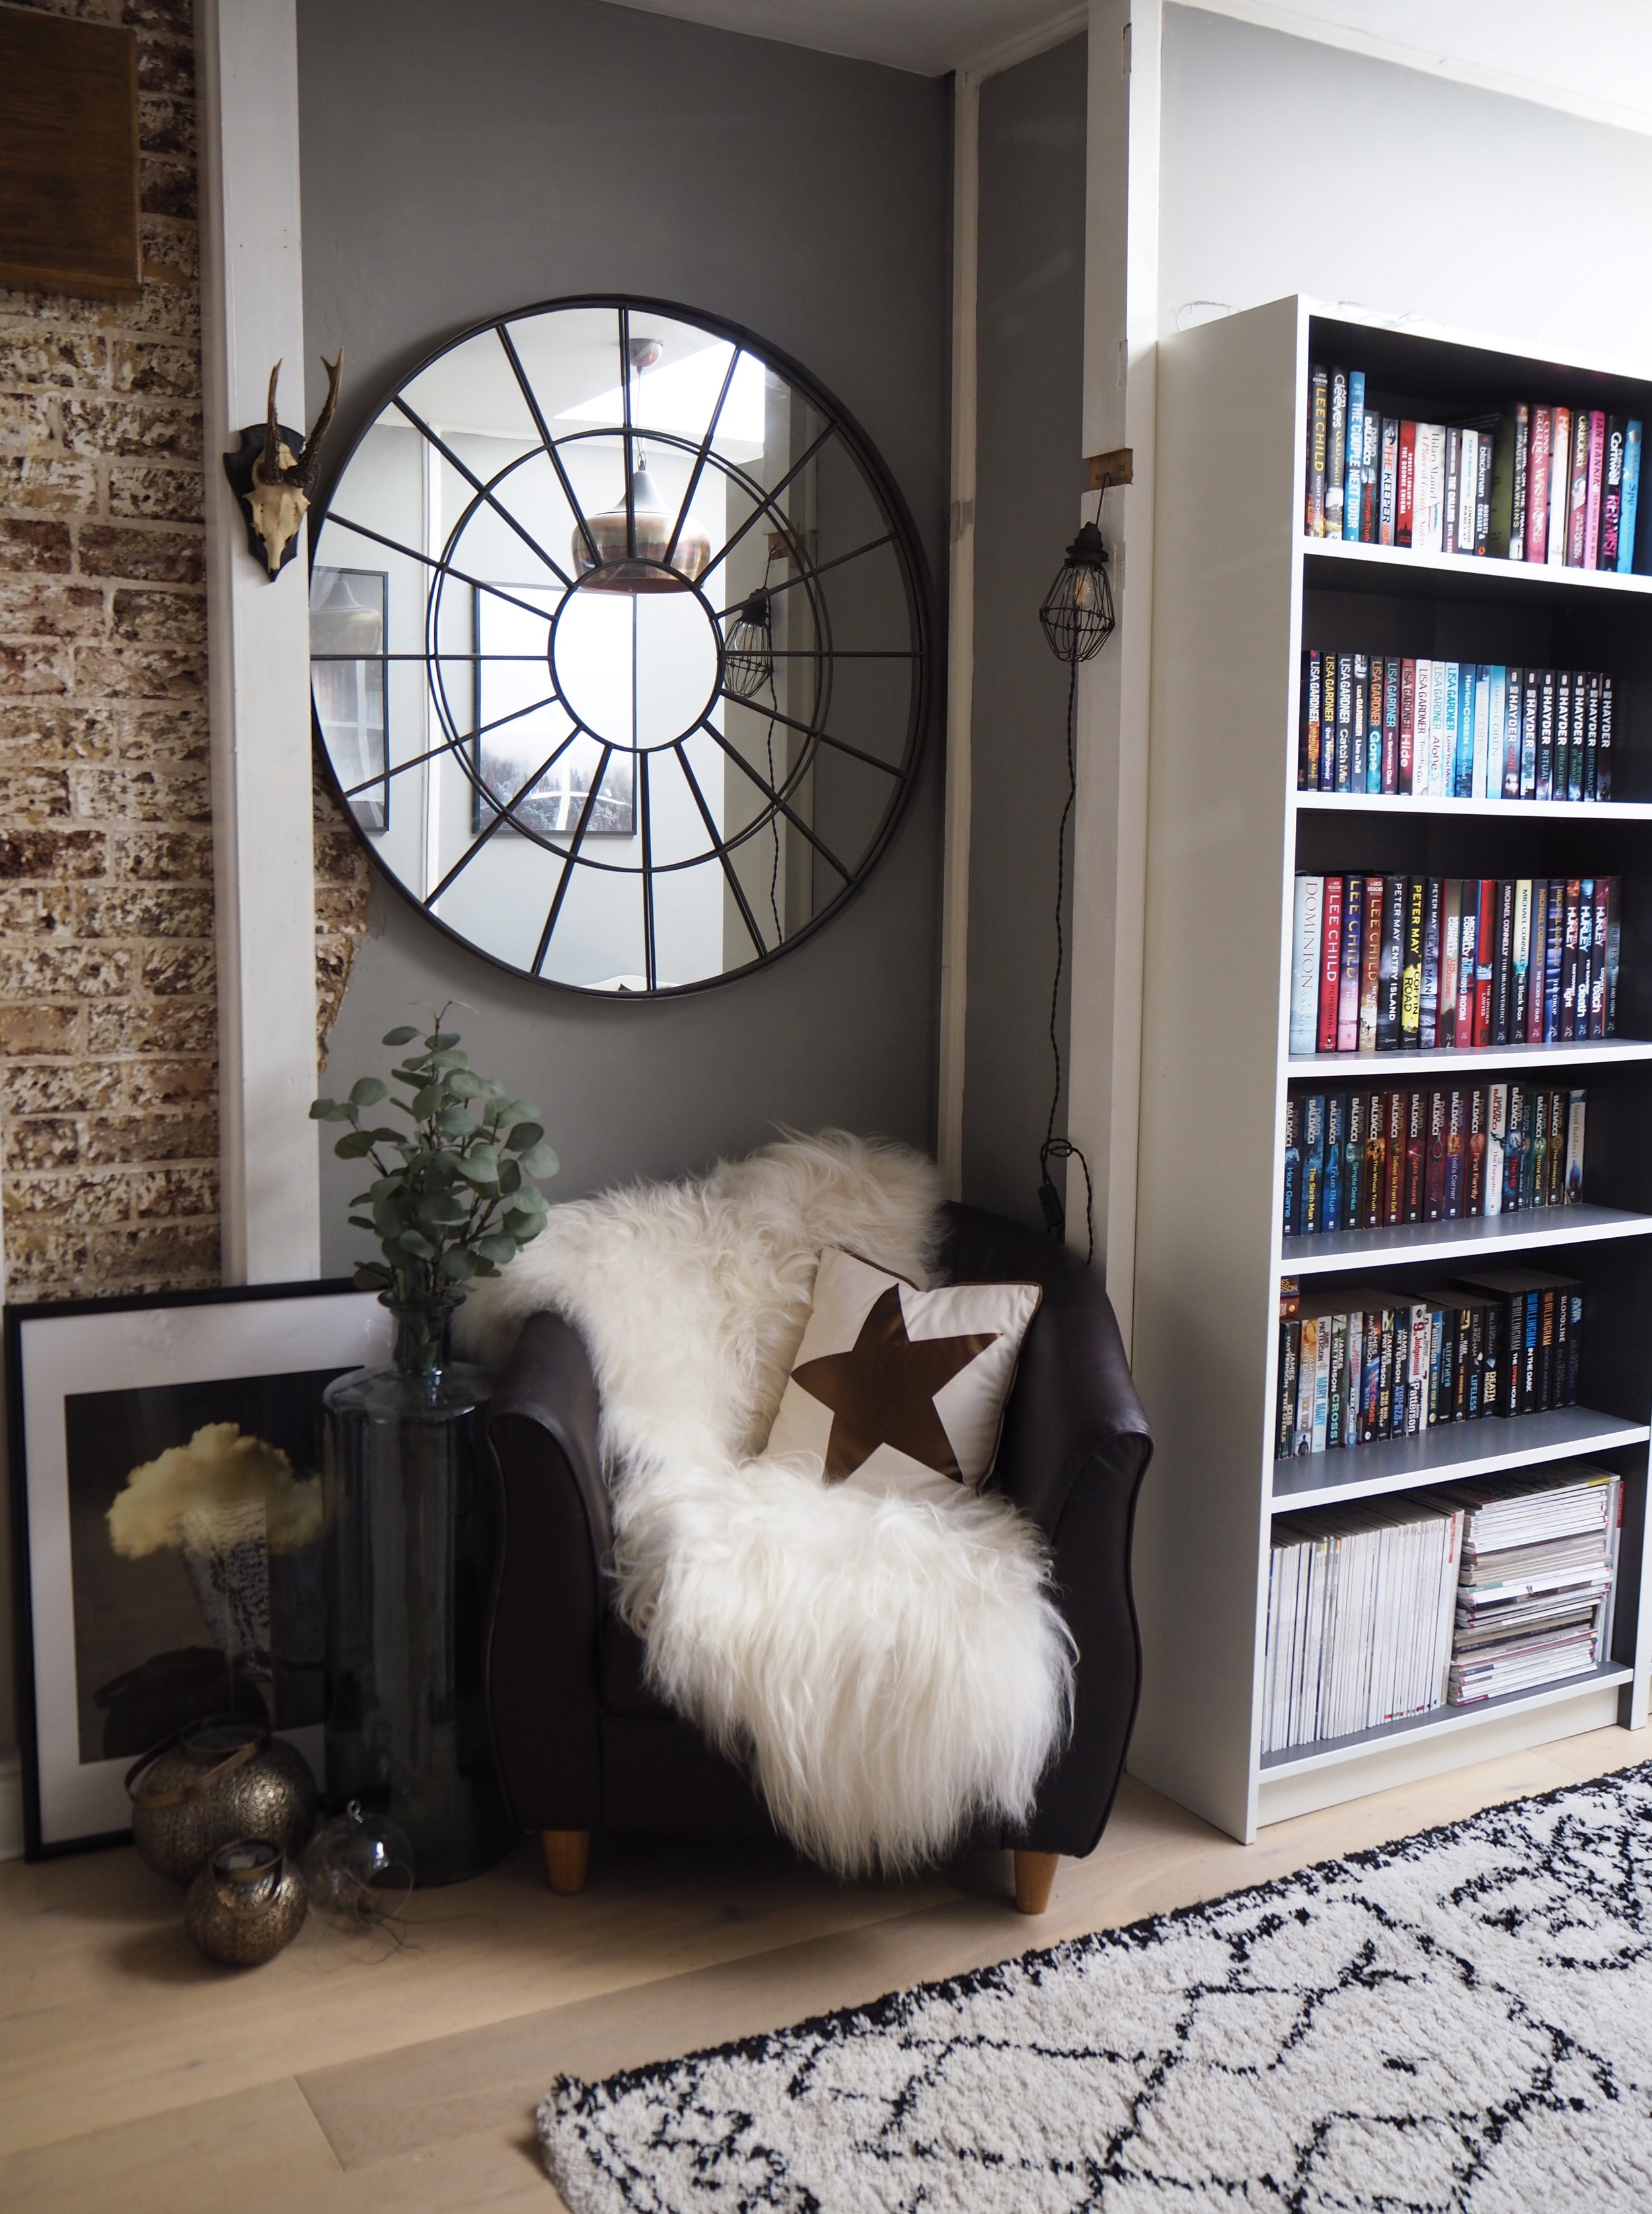 Reading corner -Bookshelves Ikea.......Sheepskin Cowboykate.....Rug La Redoute.....large g;ass jar @tigerstolilies......wall light Rockett St George